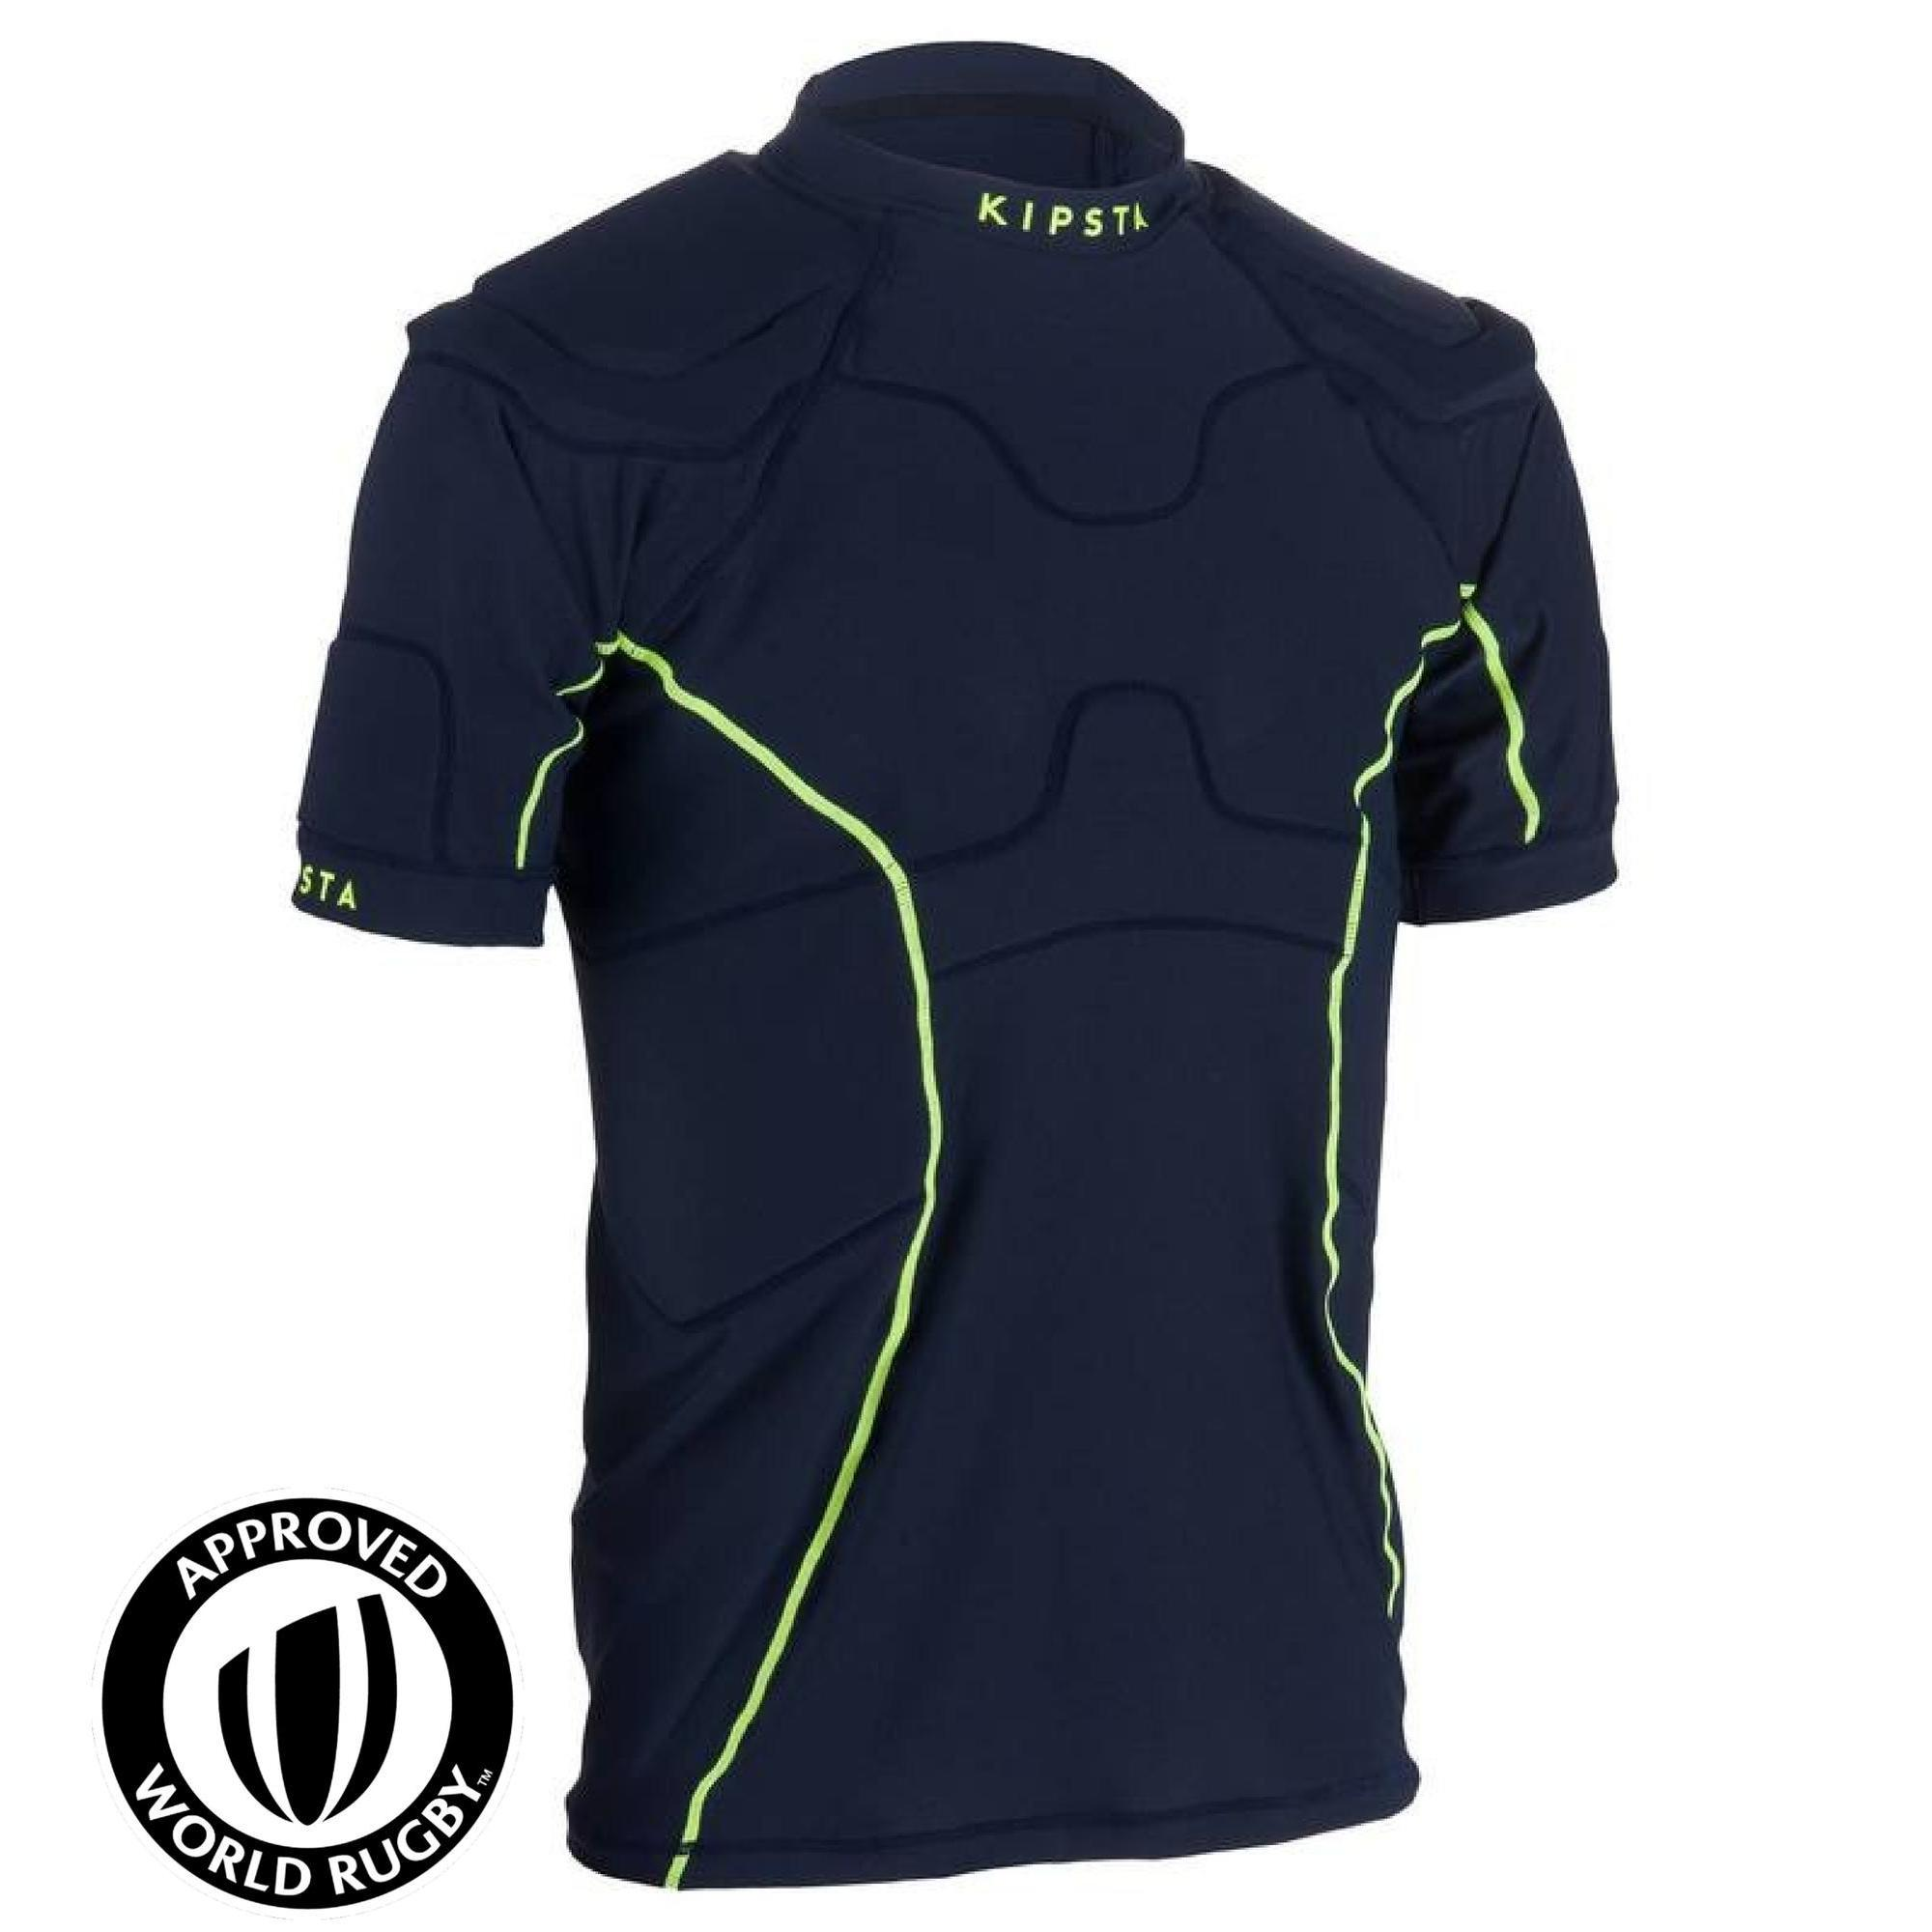 Offload Rugby shoulderpads Full H 100 marineblauw/geel (volwassenen)